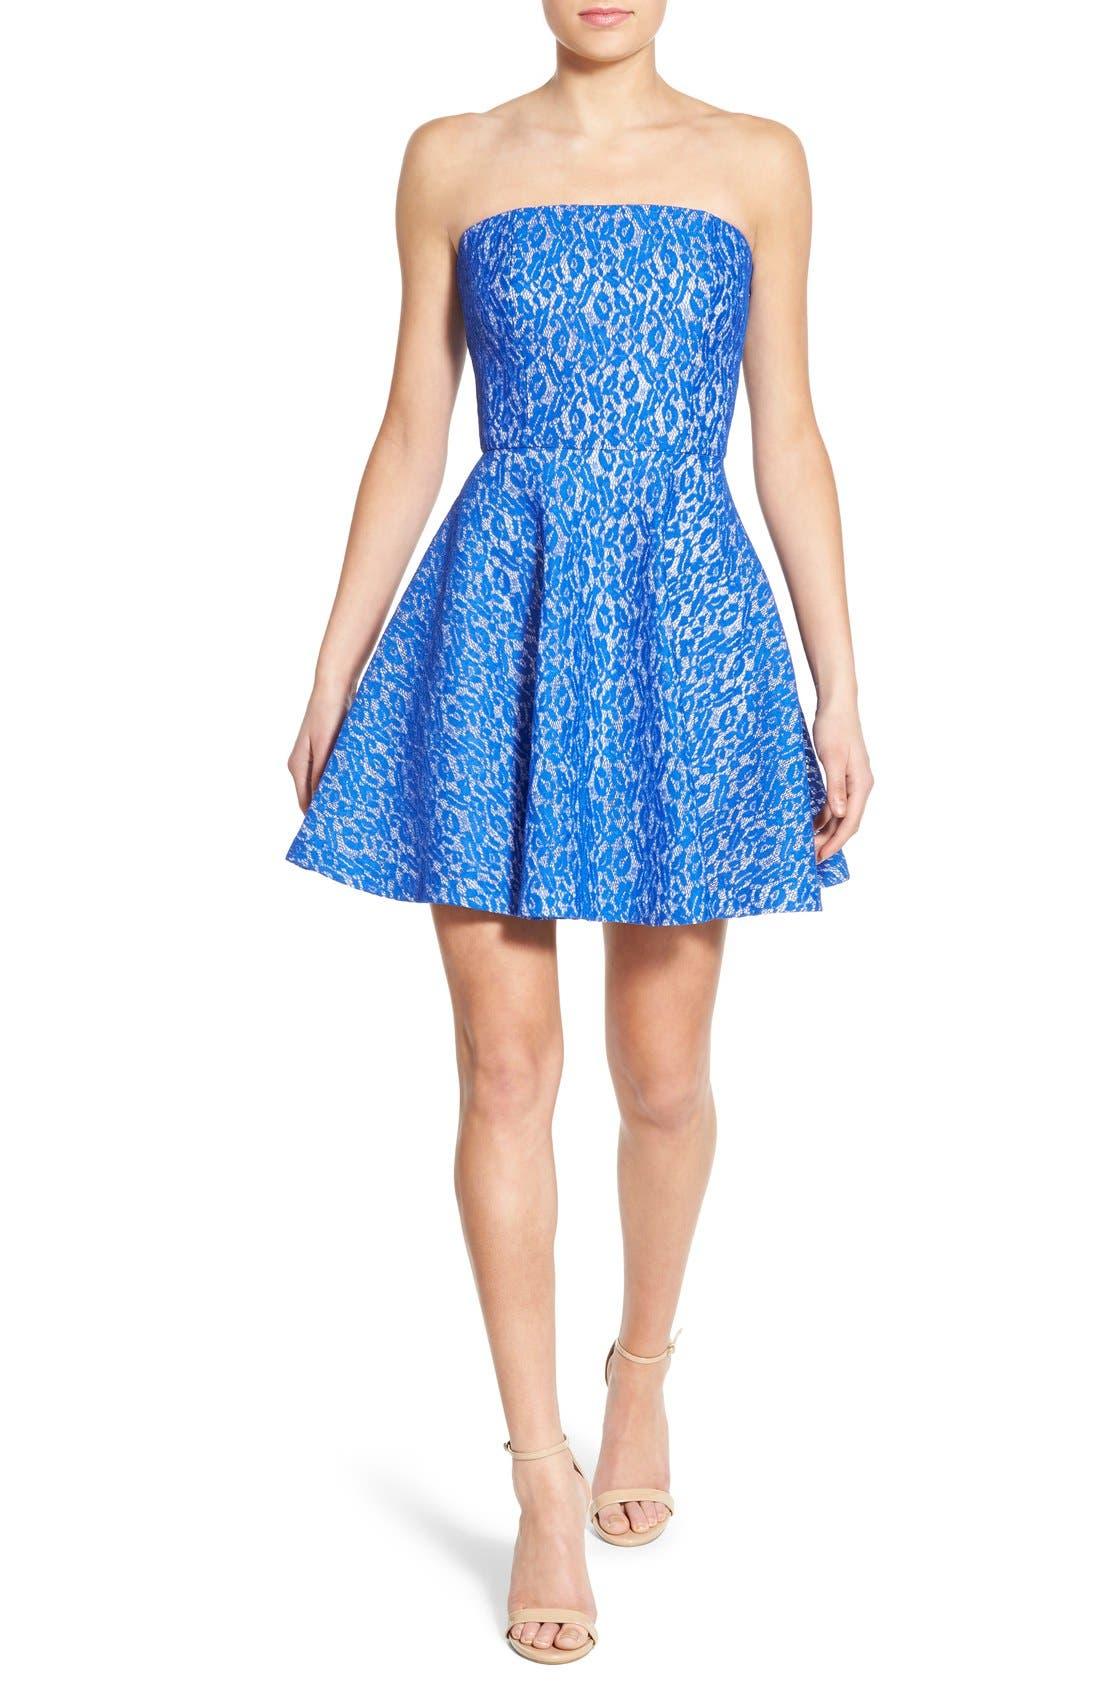 Alternate Image 1 Selected - Soloiste Lace Strapless Skater Dress